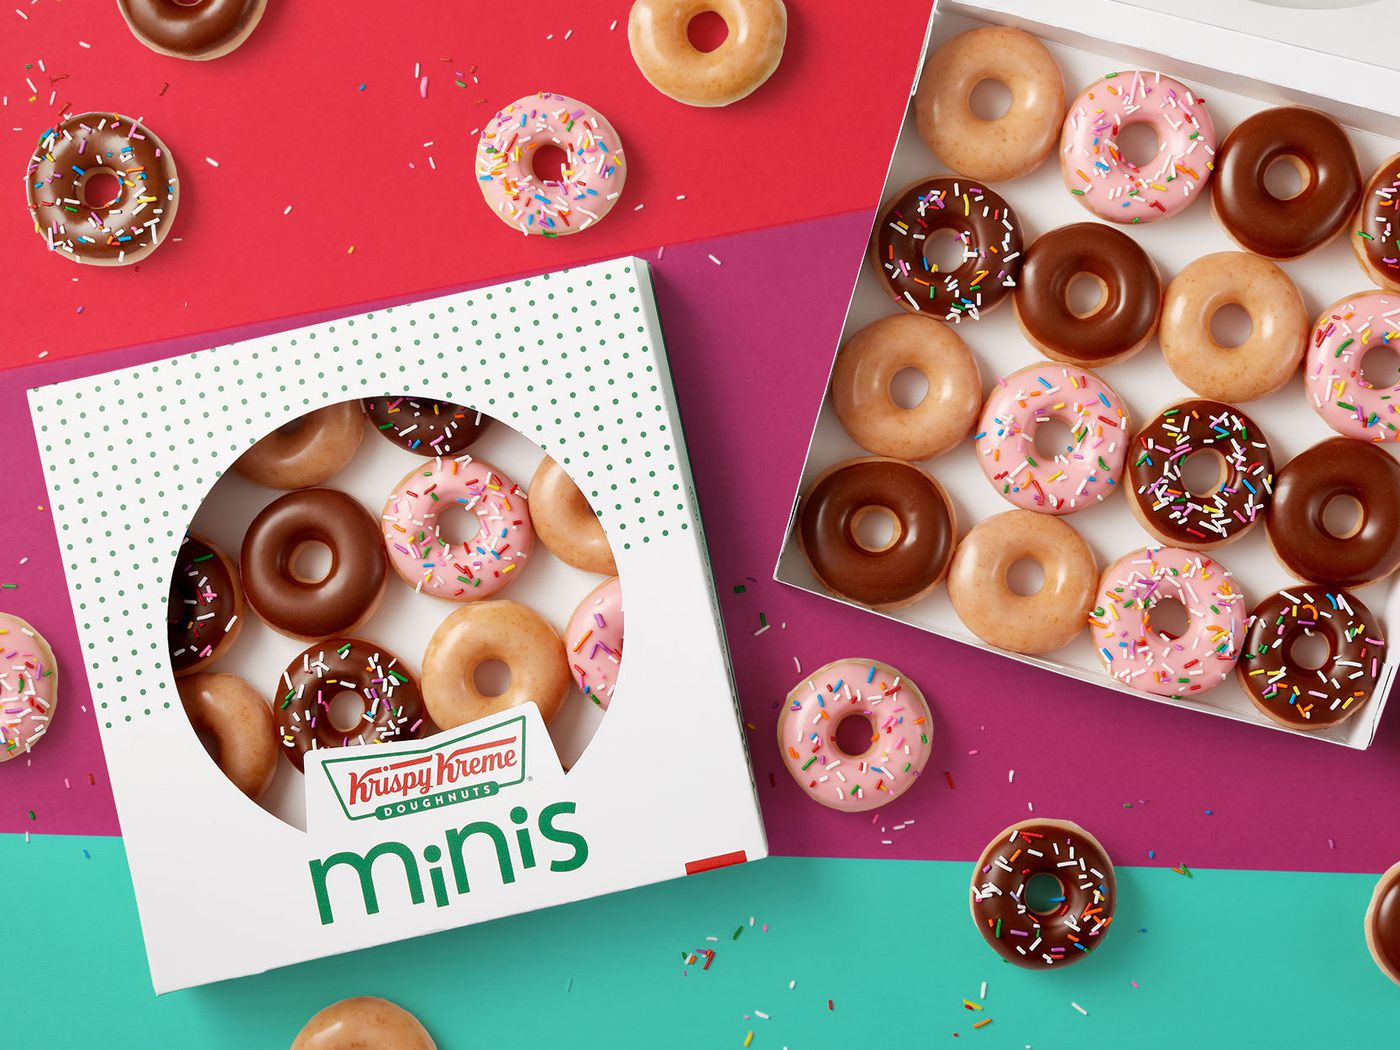 Krispy Kreme restaurant fast food donut Sign